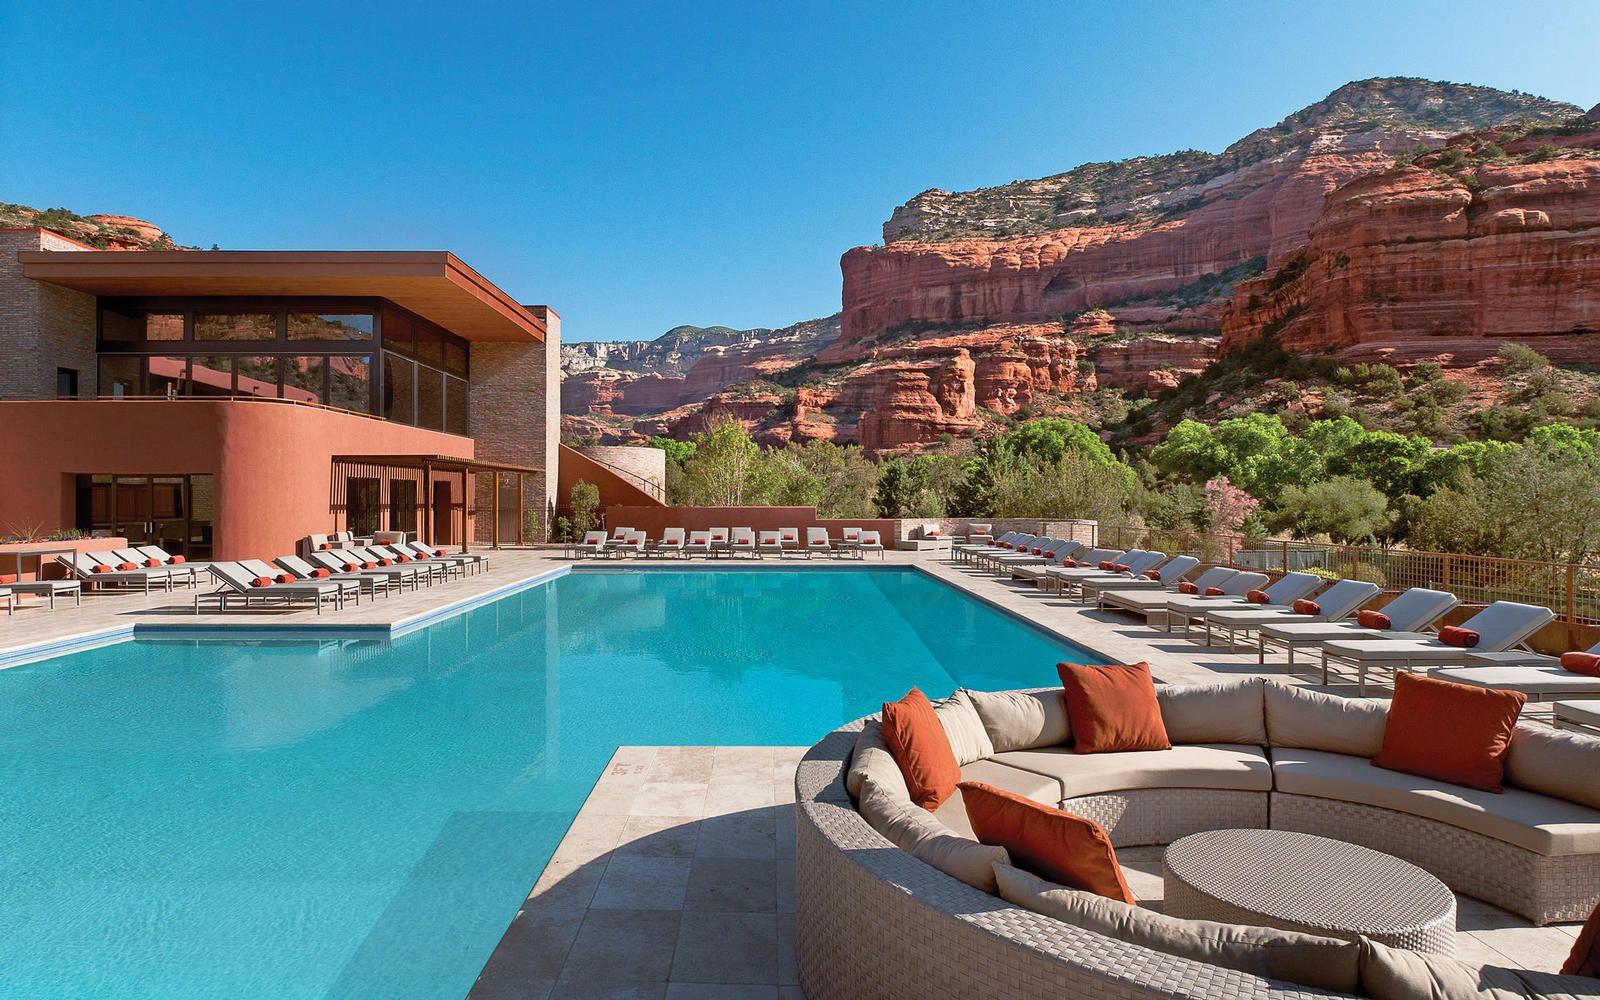 Best Kitchen Gallery: Enchantment Resort And Spa In Sedona Arizona Southwest of Sedona Arizona Hotels And Resorts  on rachelxblog.com